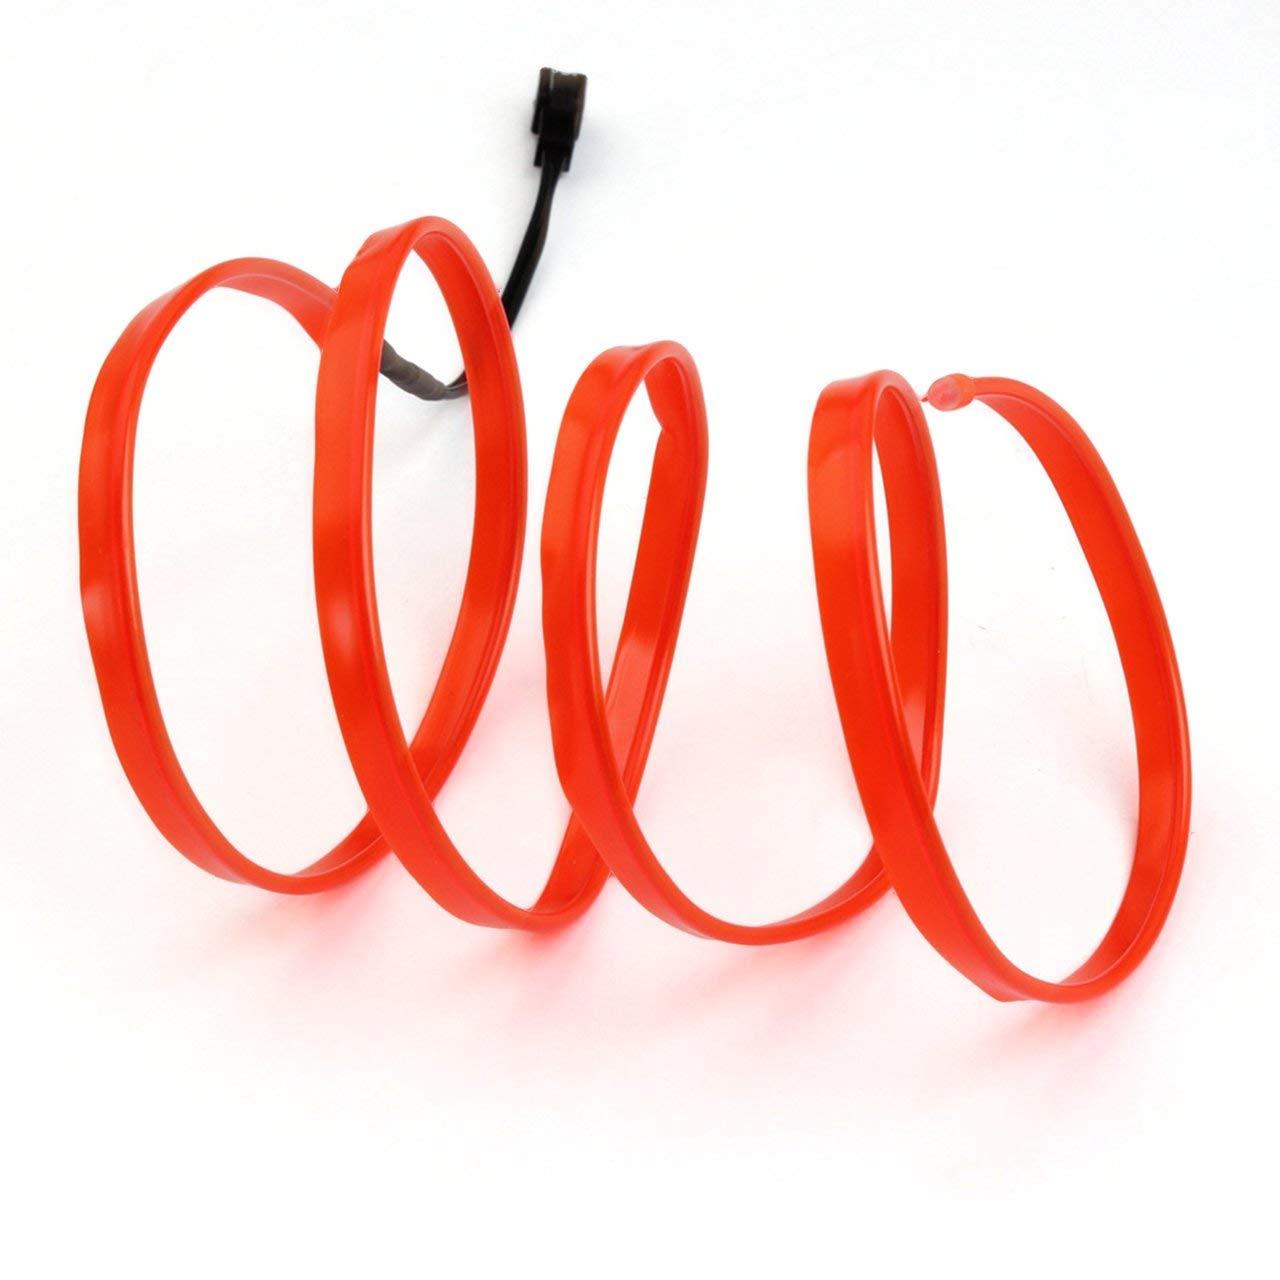 rot 12 V Controller USB Stick Auto Dekoration Licht Auto Styling Party Decor LED EL Licht Neon Seil Auto Dance Glow Light Strip 3 V